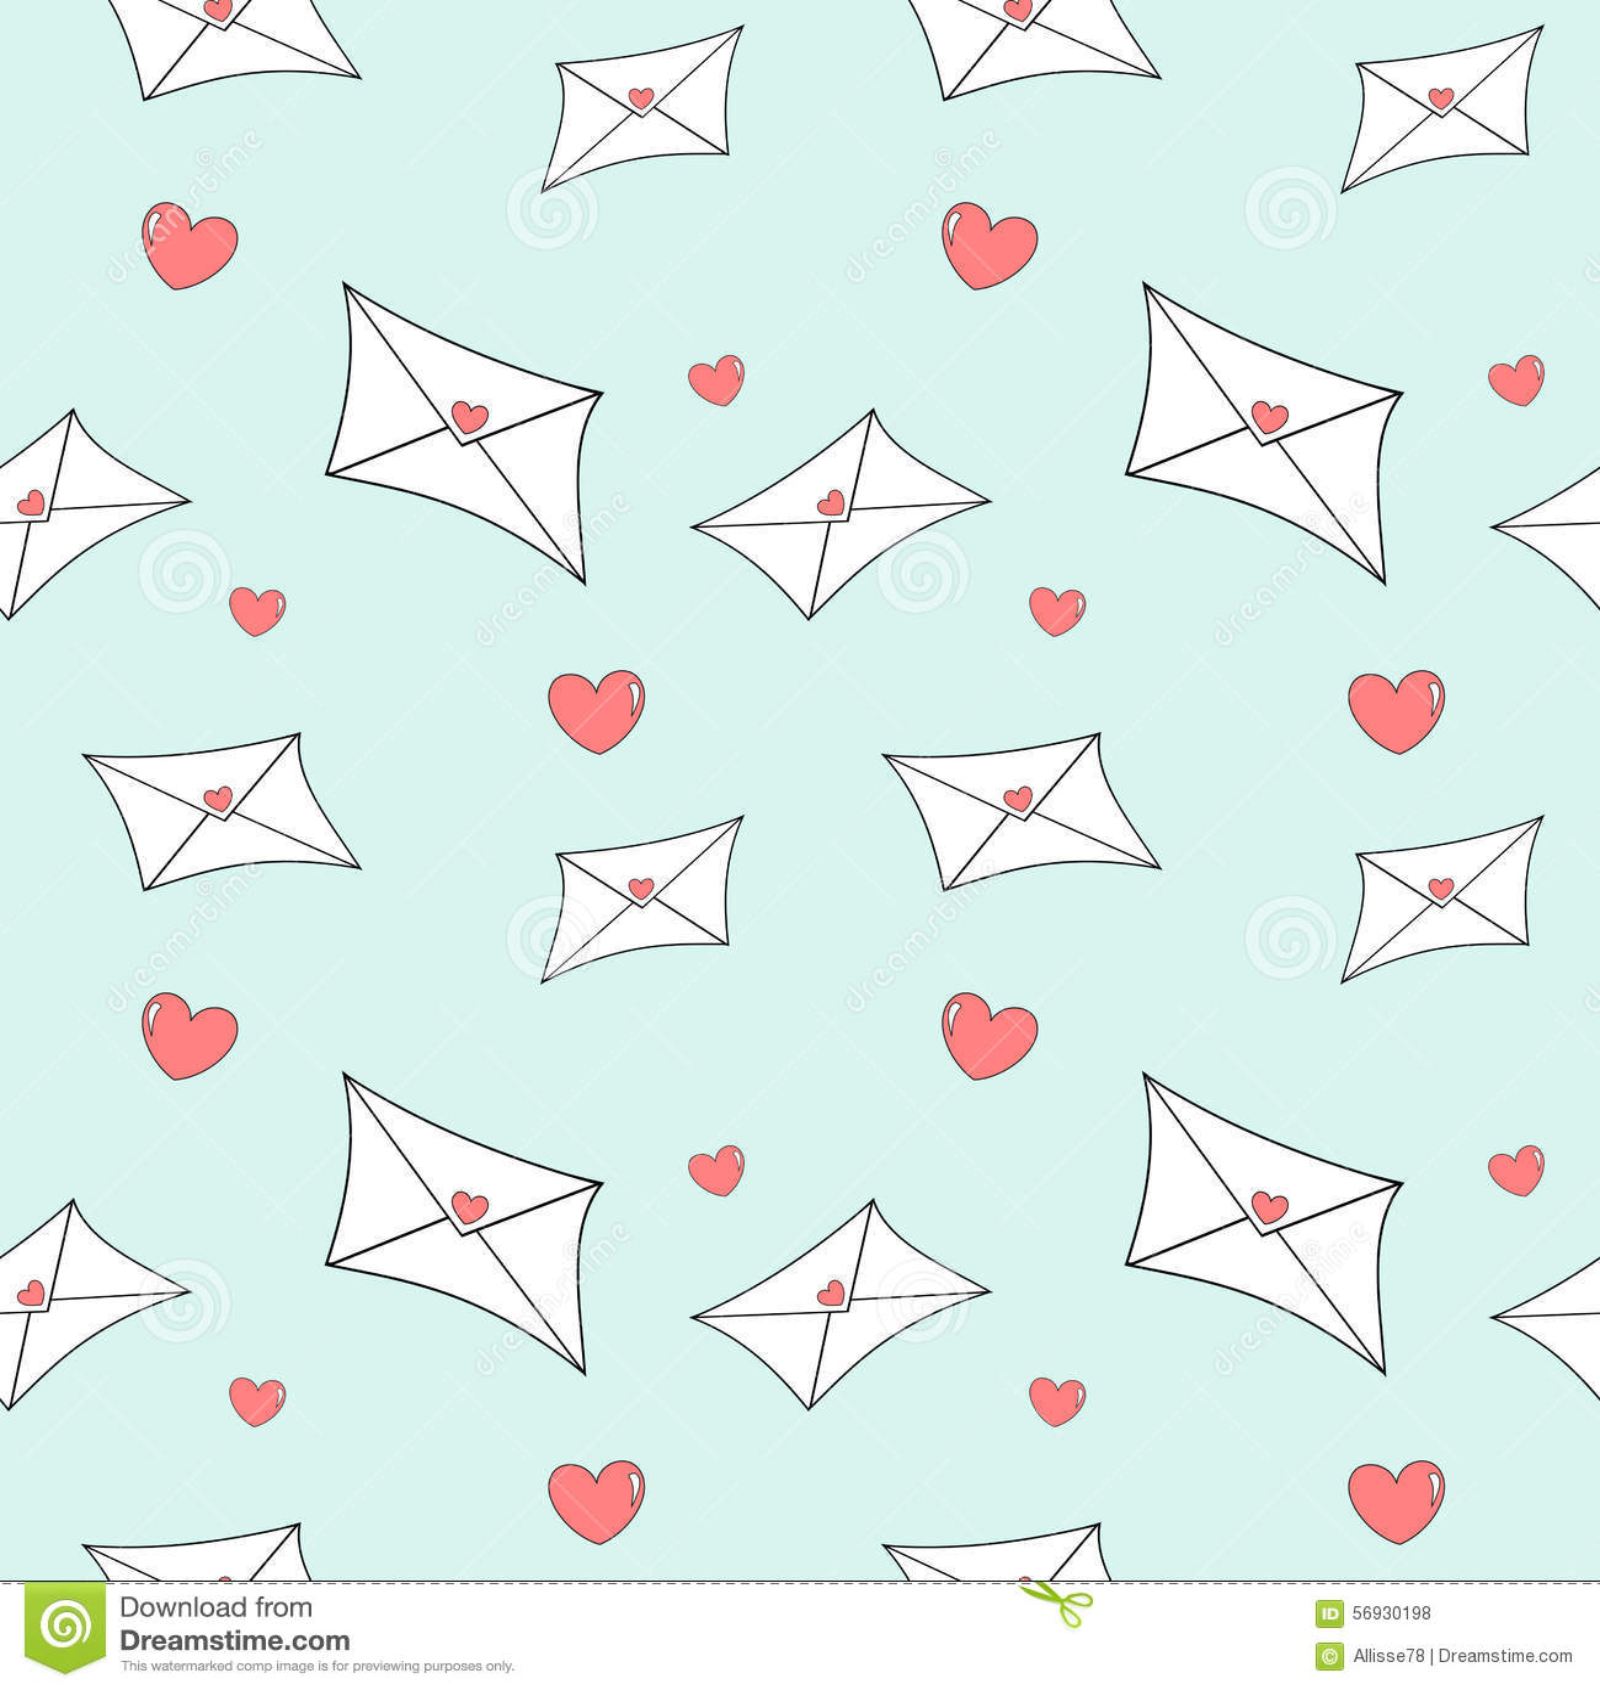 Cute Cartoon Love Mail Letter Seamless Pattern